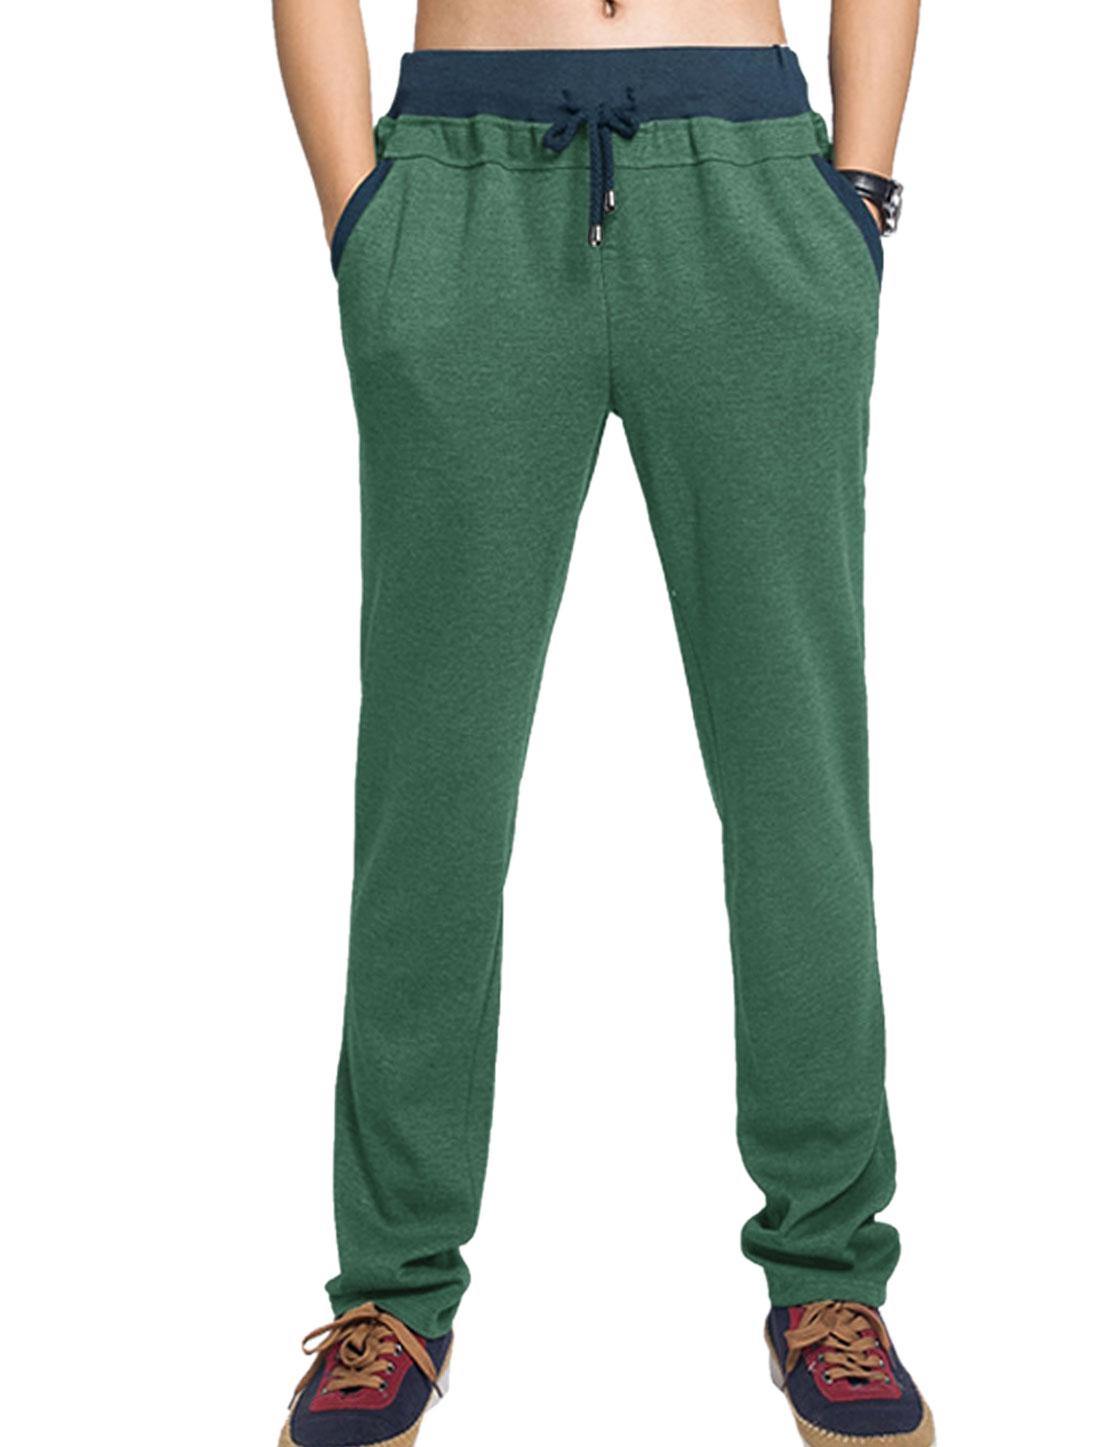 Men Slant Front Pockets Mid Rise Casual Pants Green W32